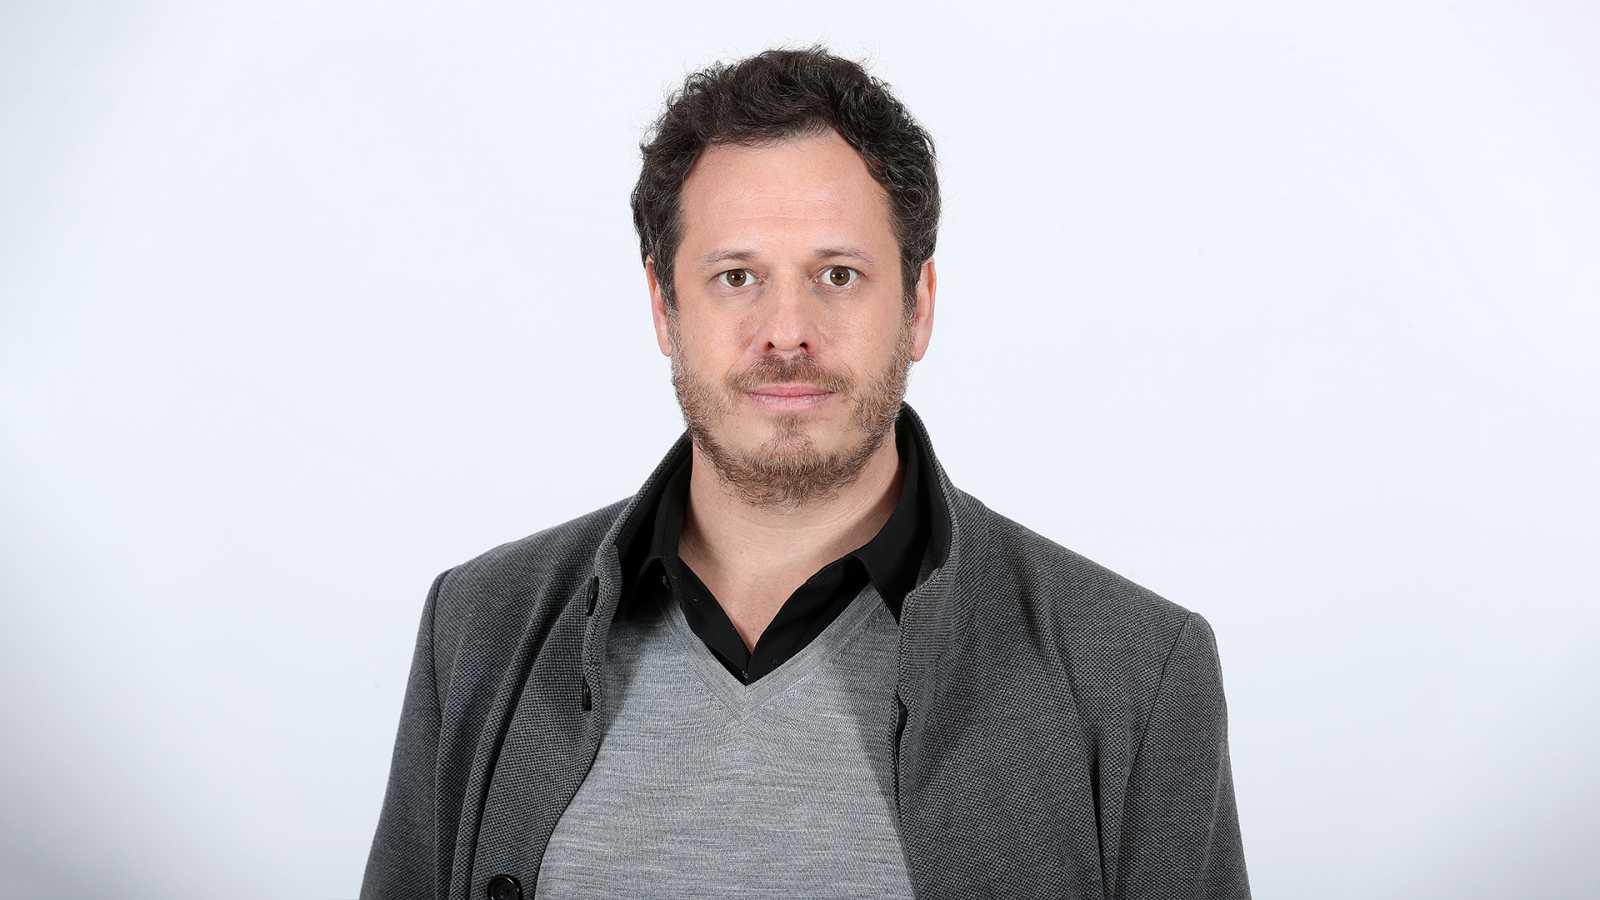 Brian Sellei, mánager en la Academia de Operación Triunfo 2020